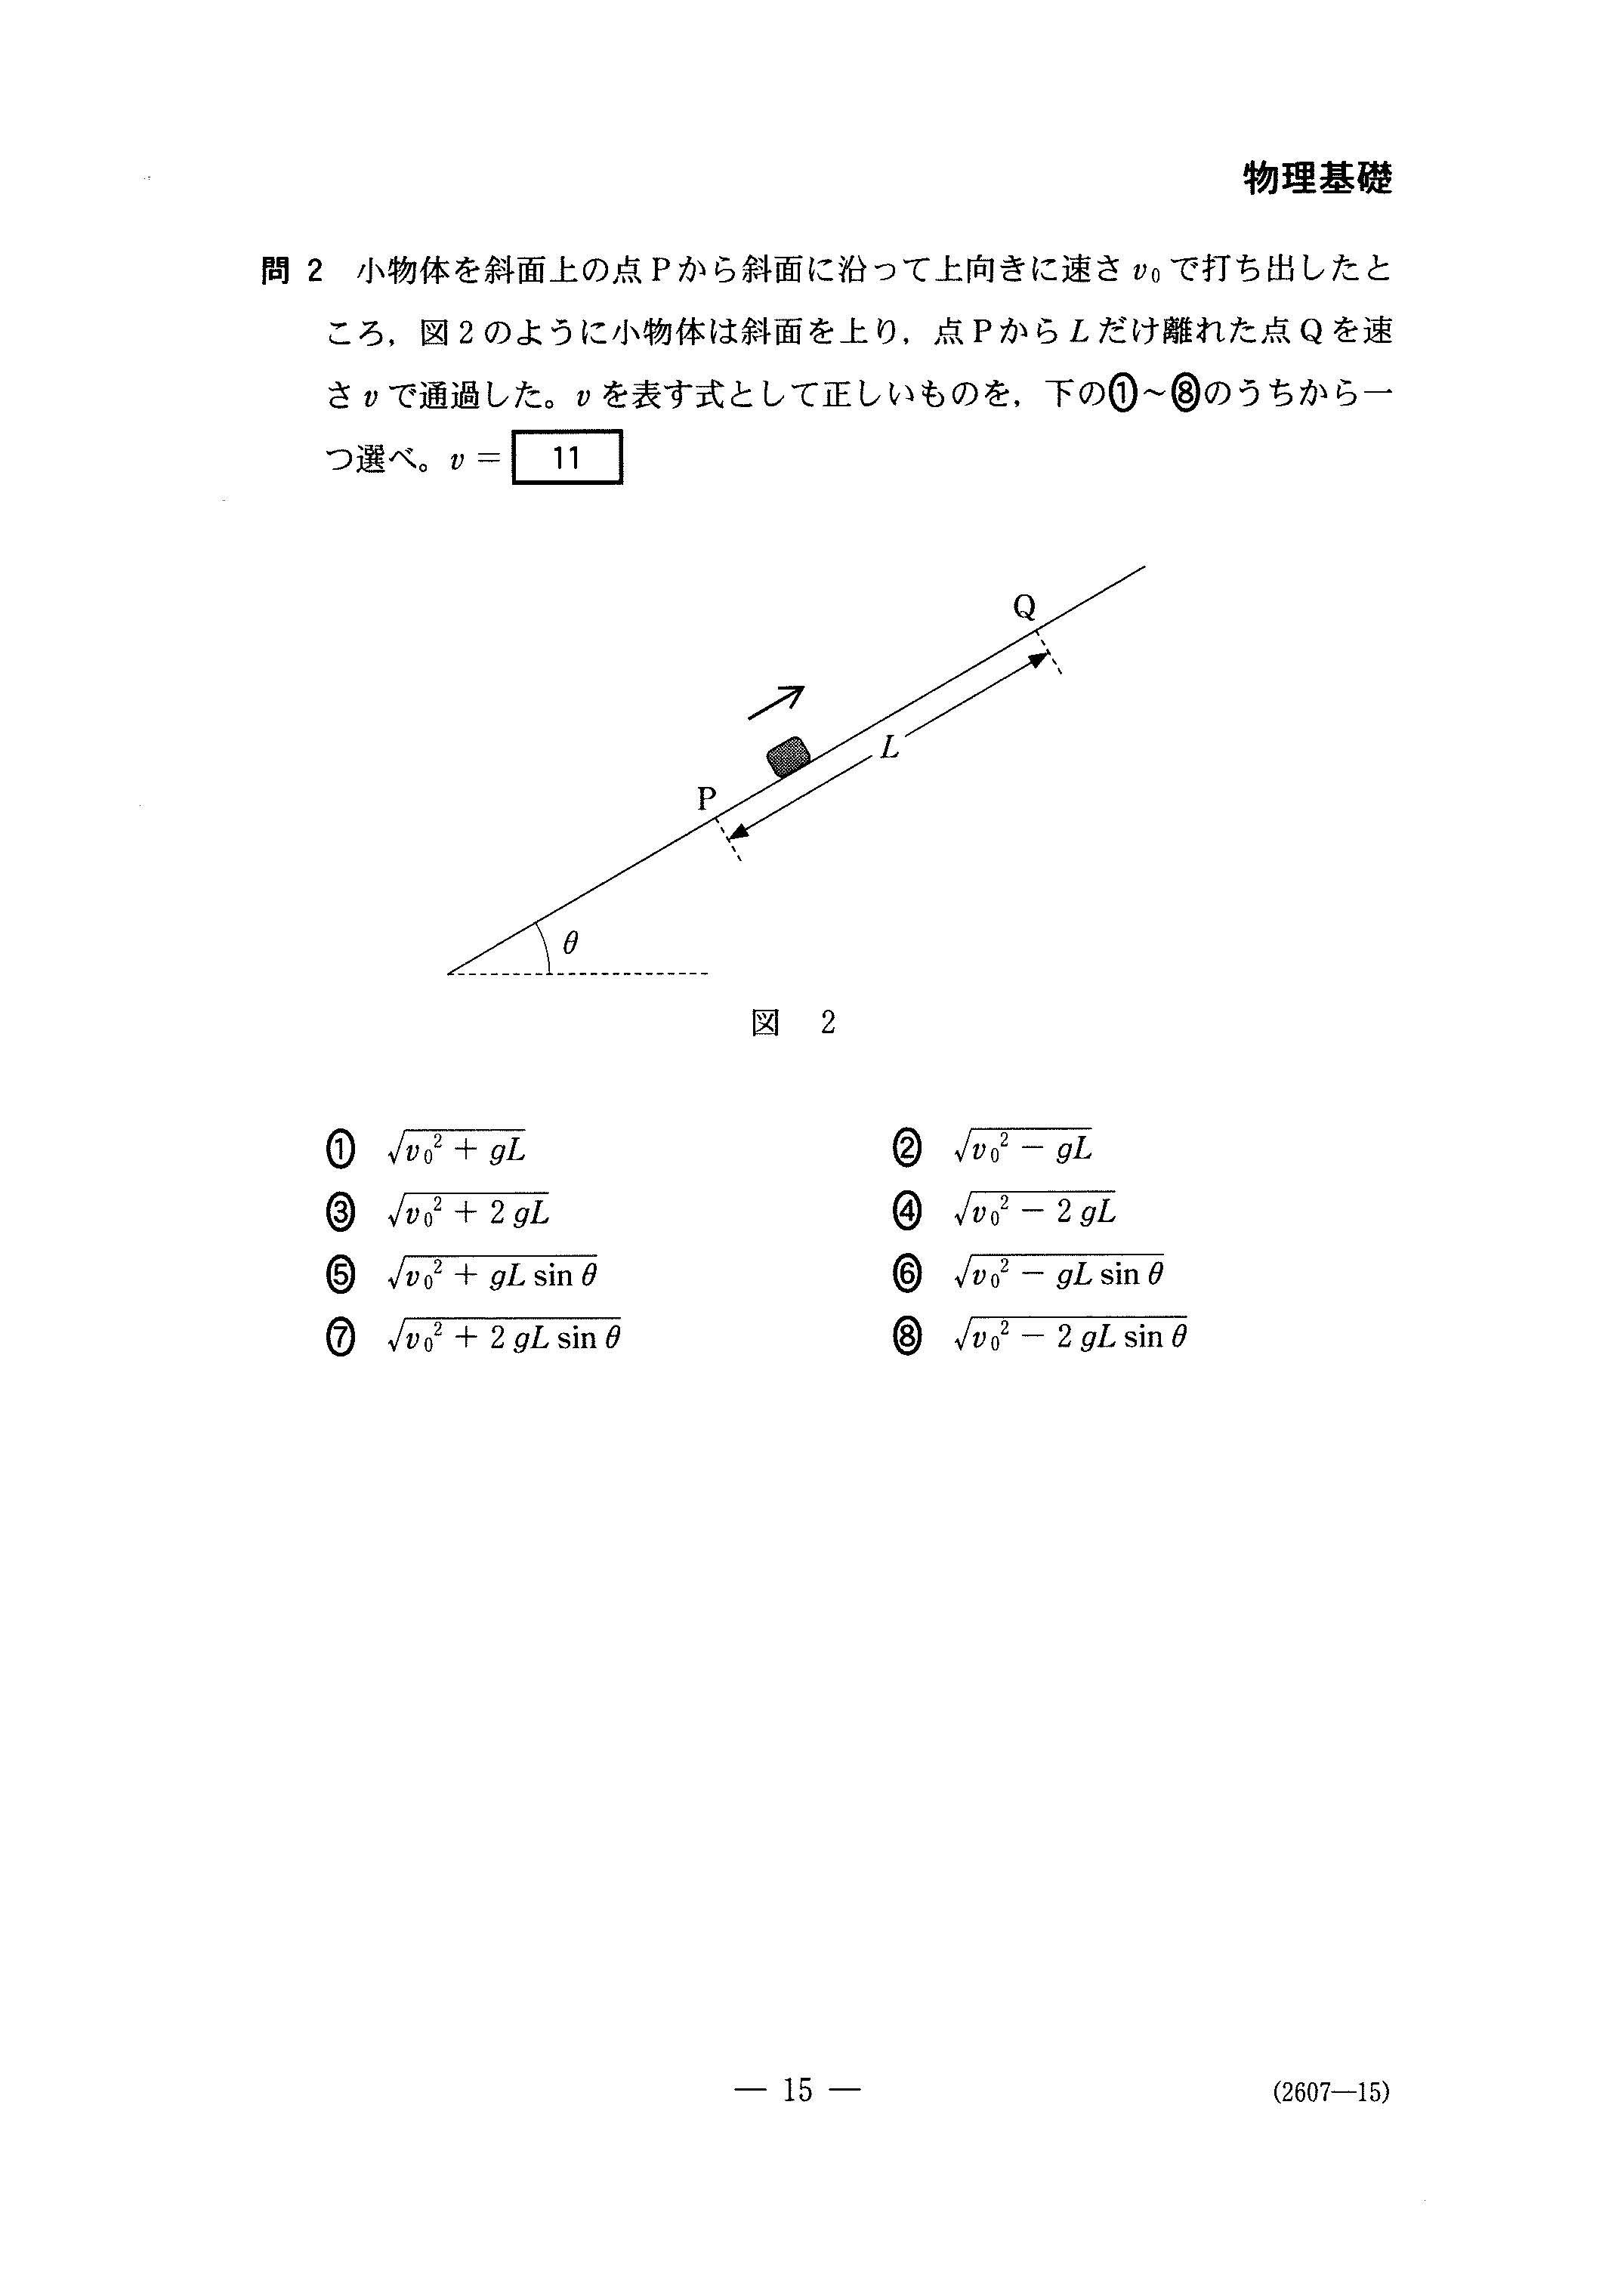 H29理科_物理基礎 大学入試センター試験過去問